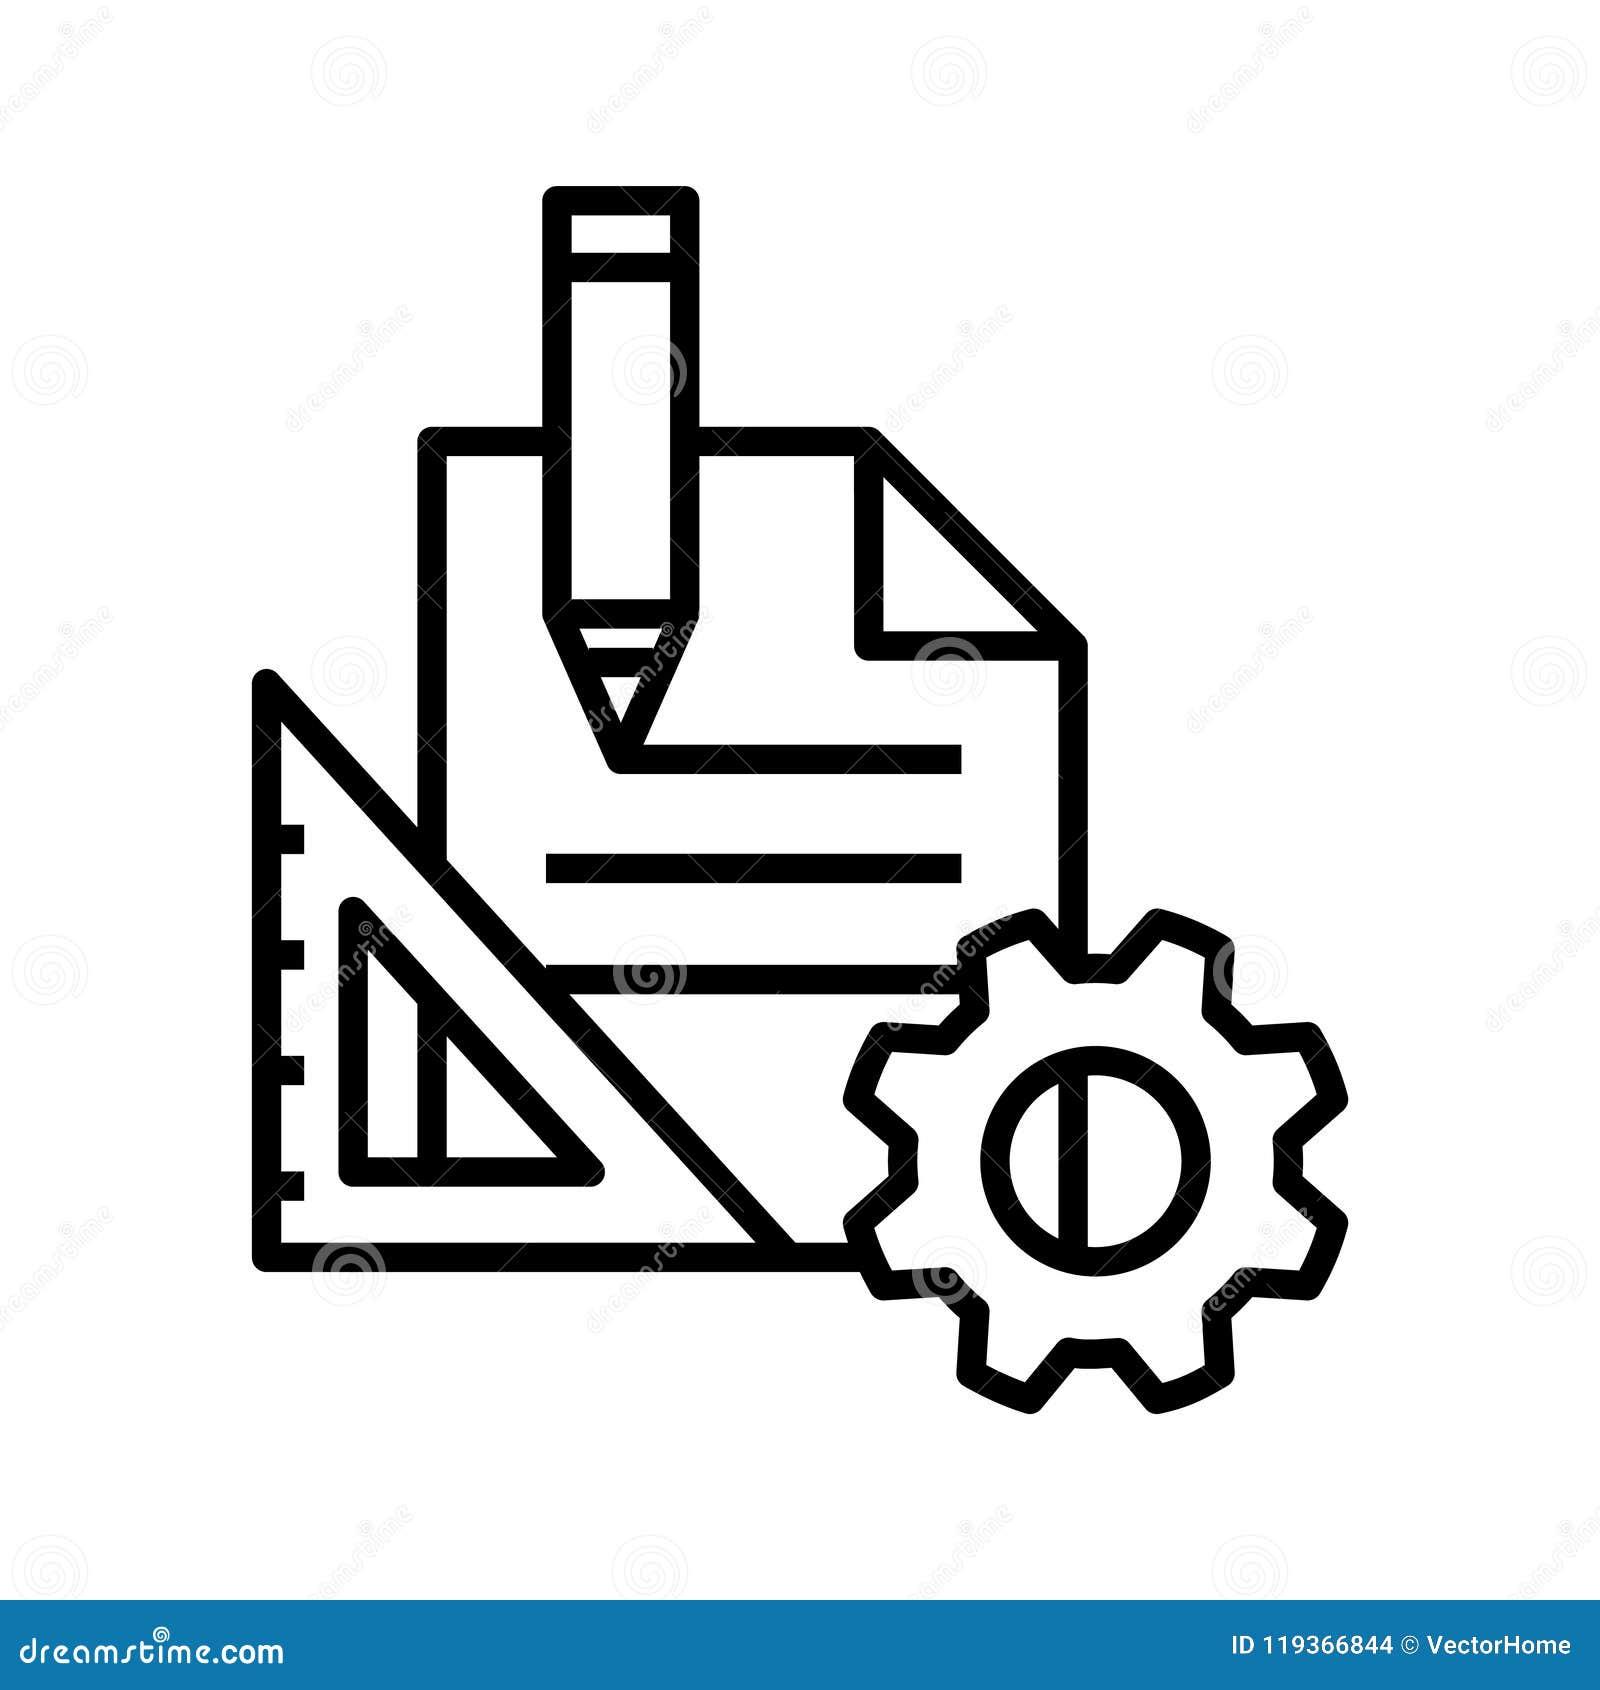 Project Management Icon Images, Stock Photos & Vectors